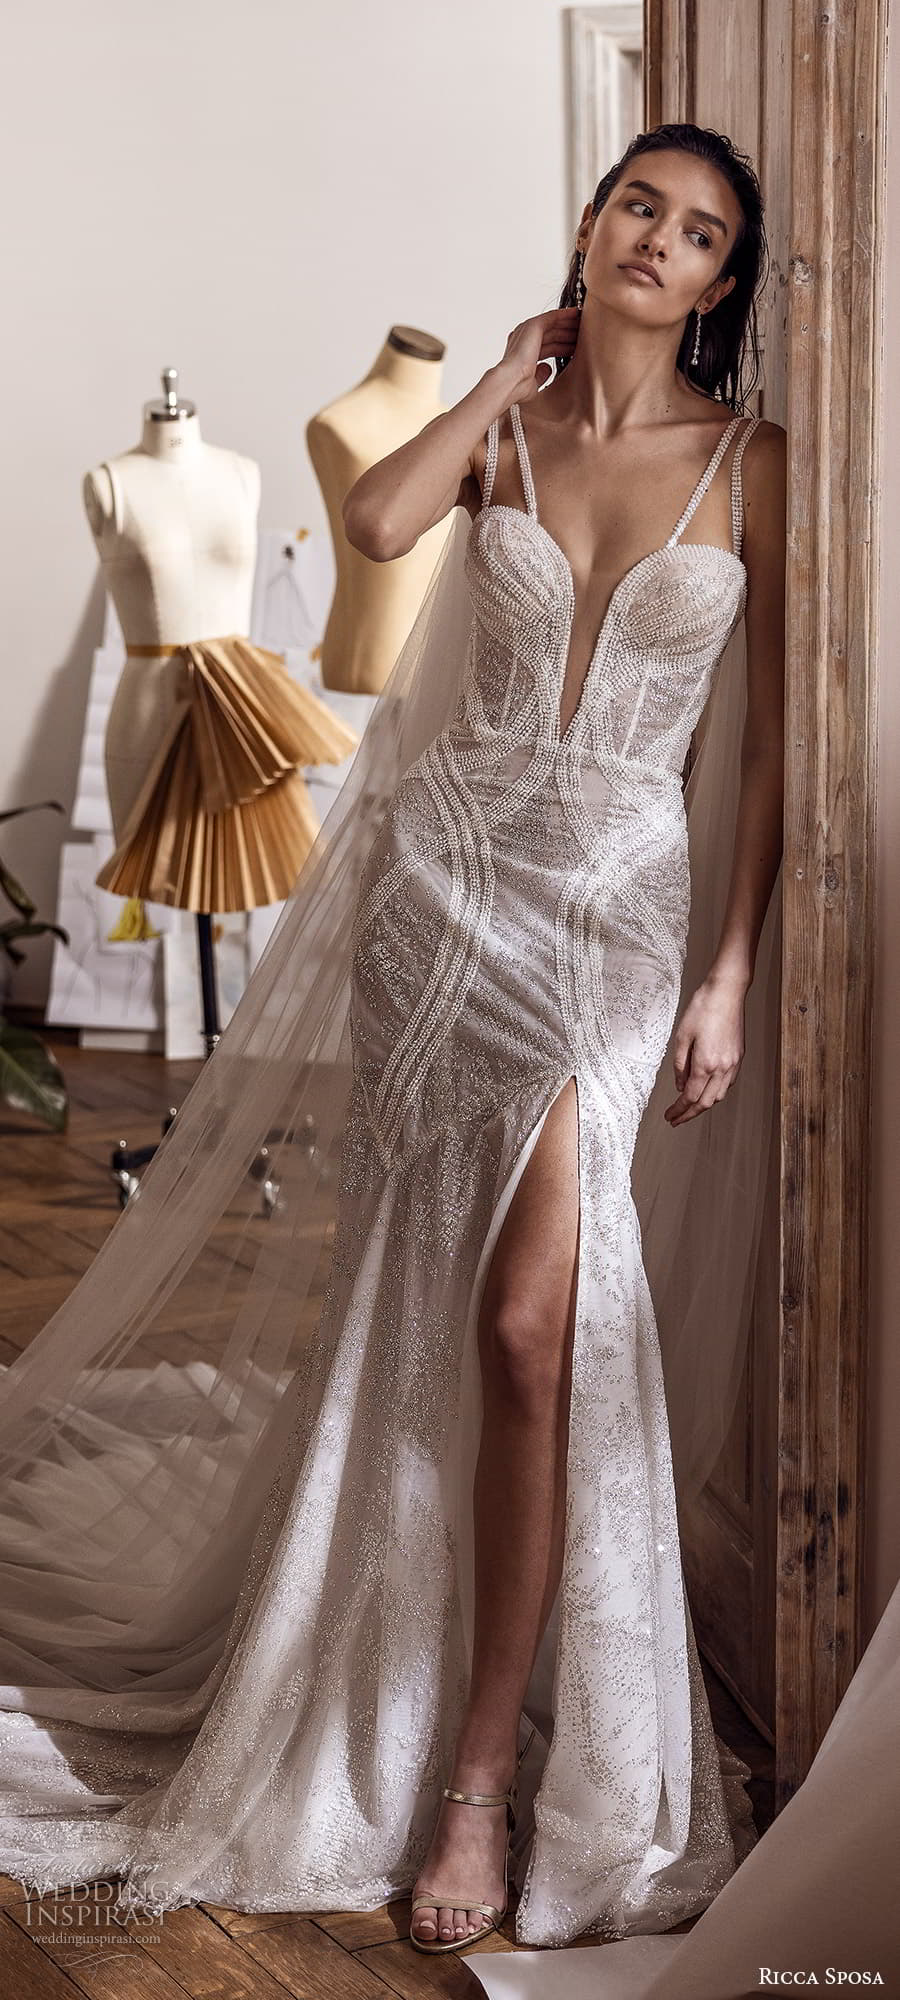 ricca sposa 2022 bridal sleeveless double straps plunging sweetheart neckline fit flare mermid wedding dress slit skirt chapel train (19) lv